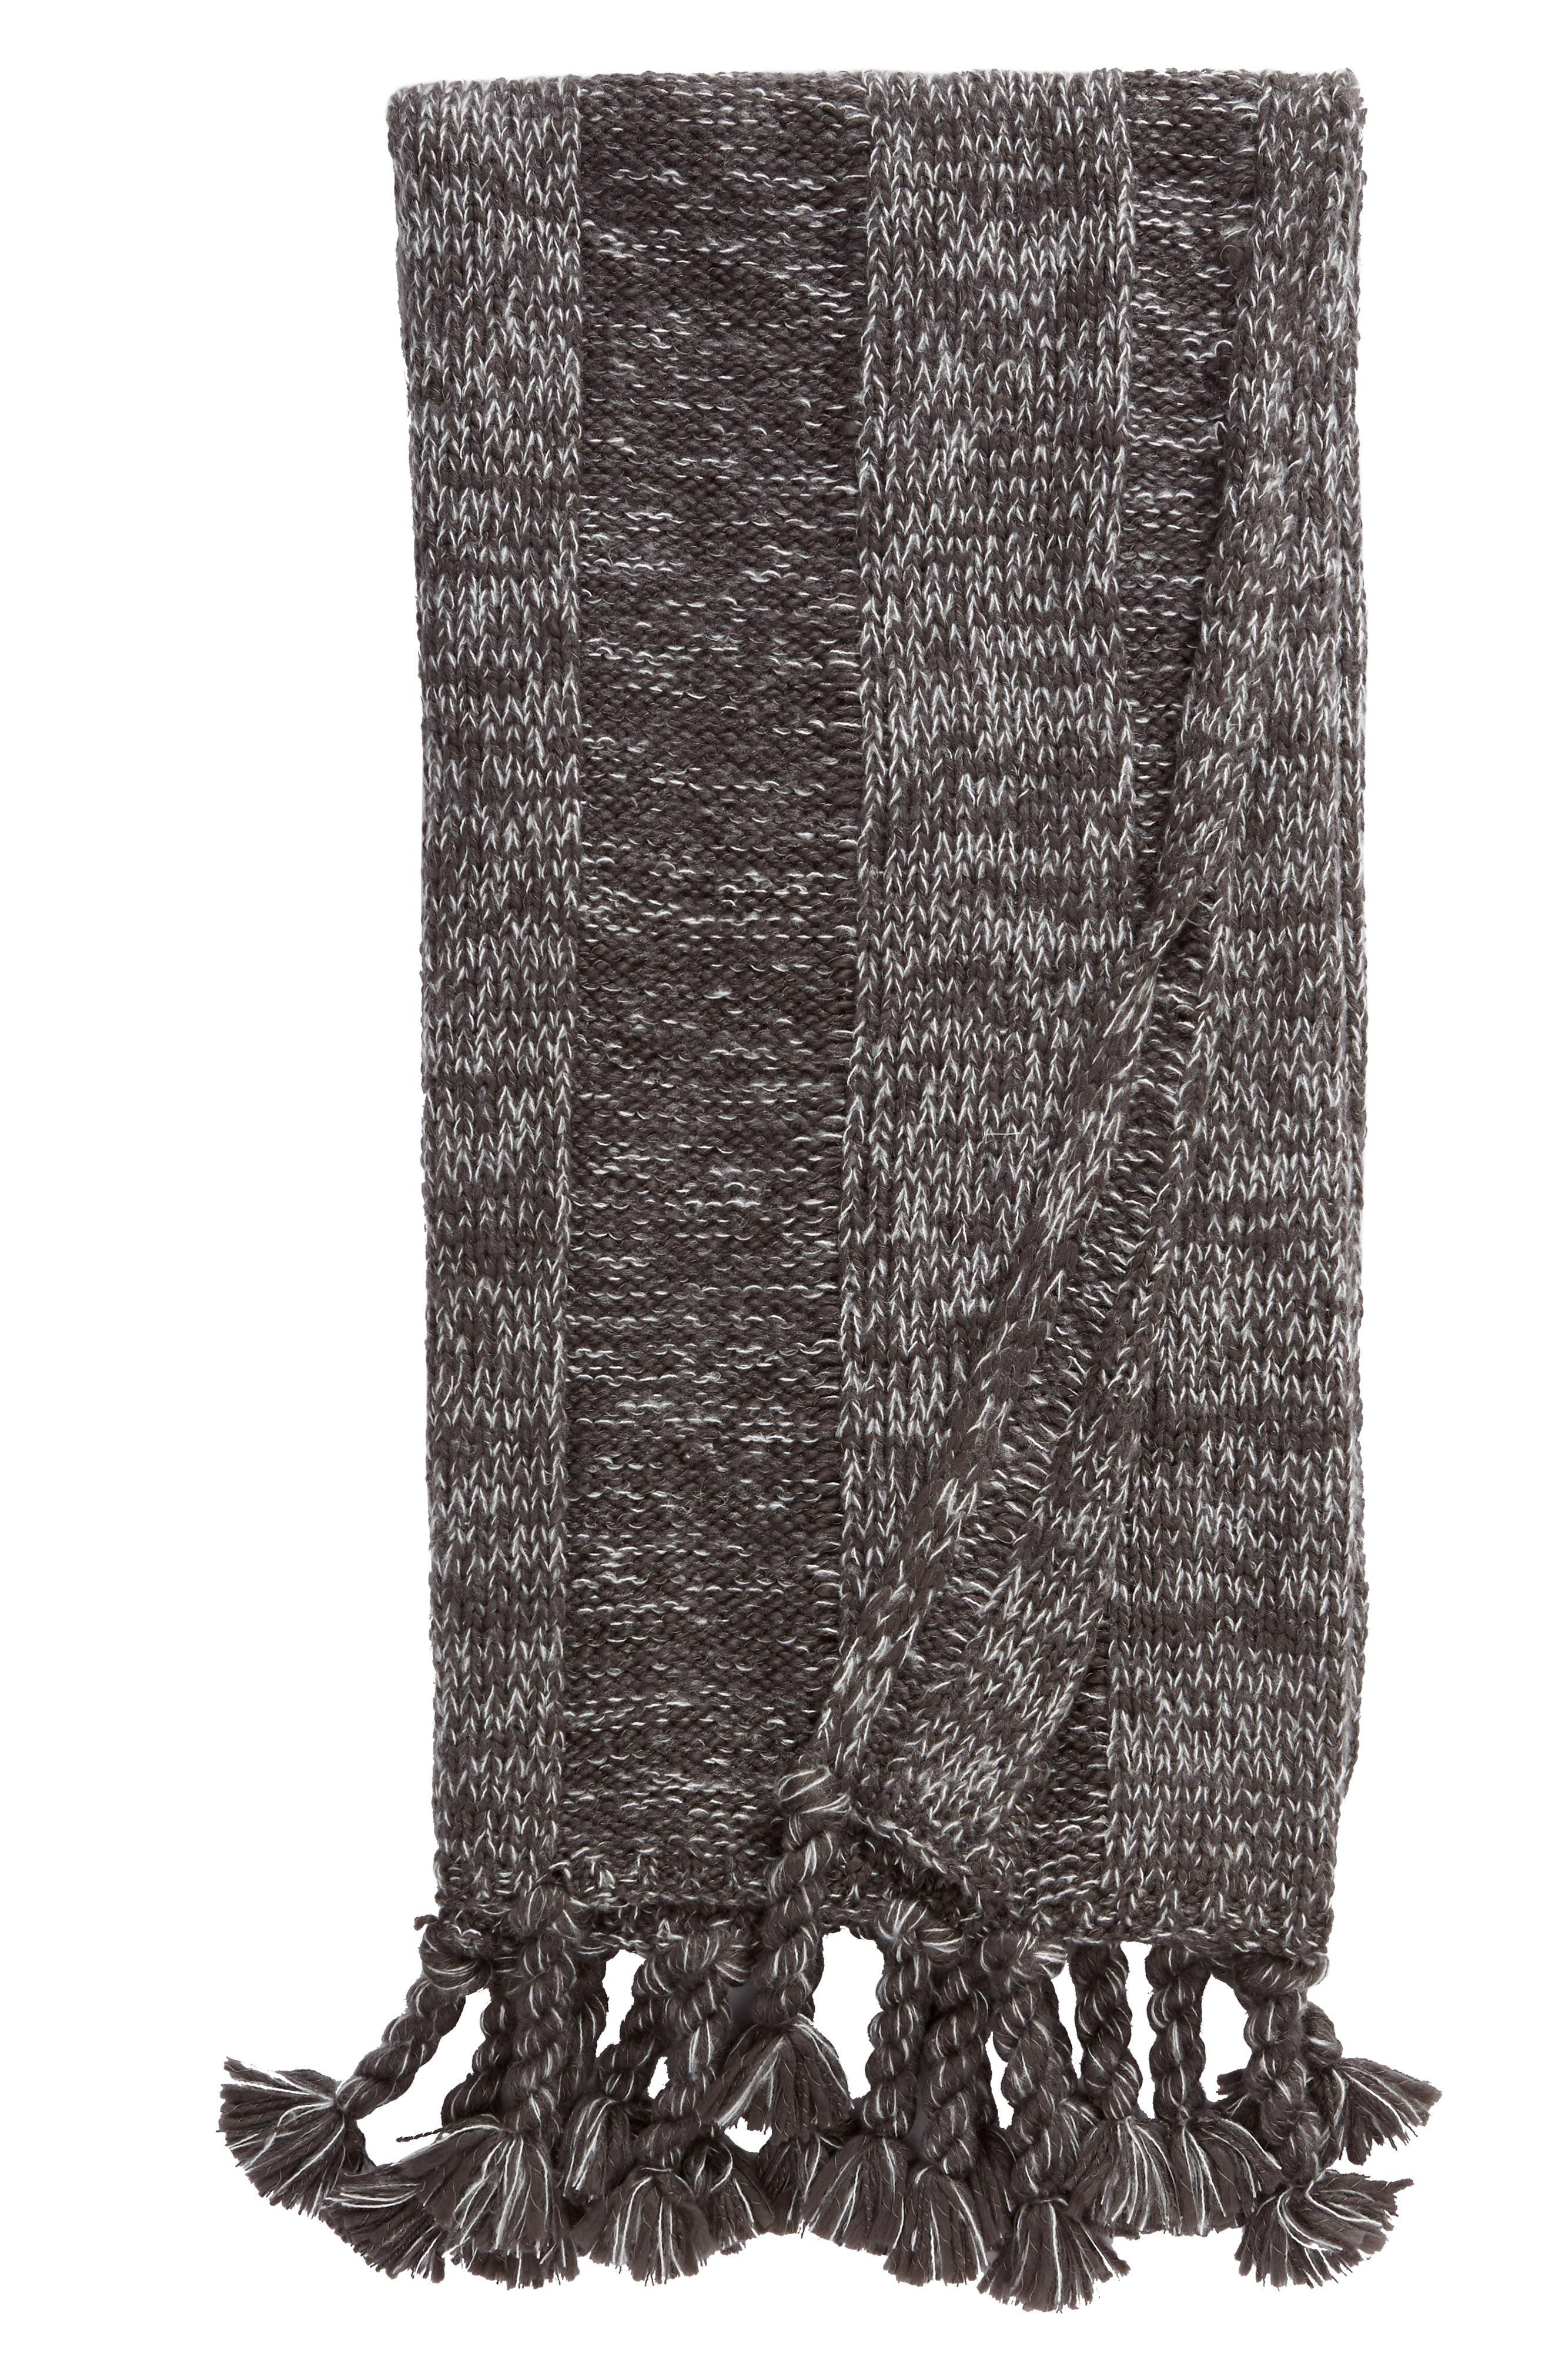 TREASURE & BOND, Fringe Knit Throw, Main thumbnail 1, color, GREY ONYX